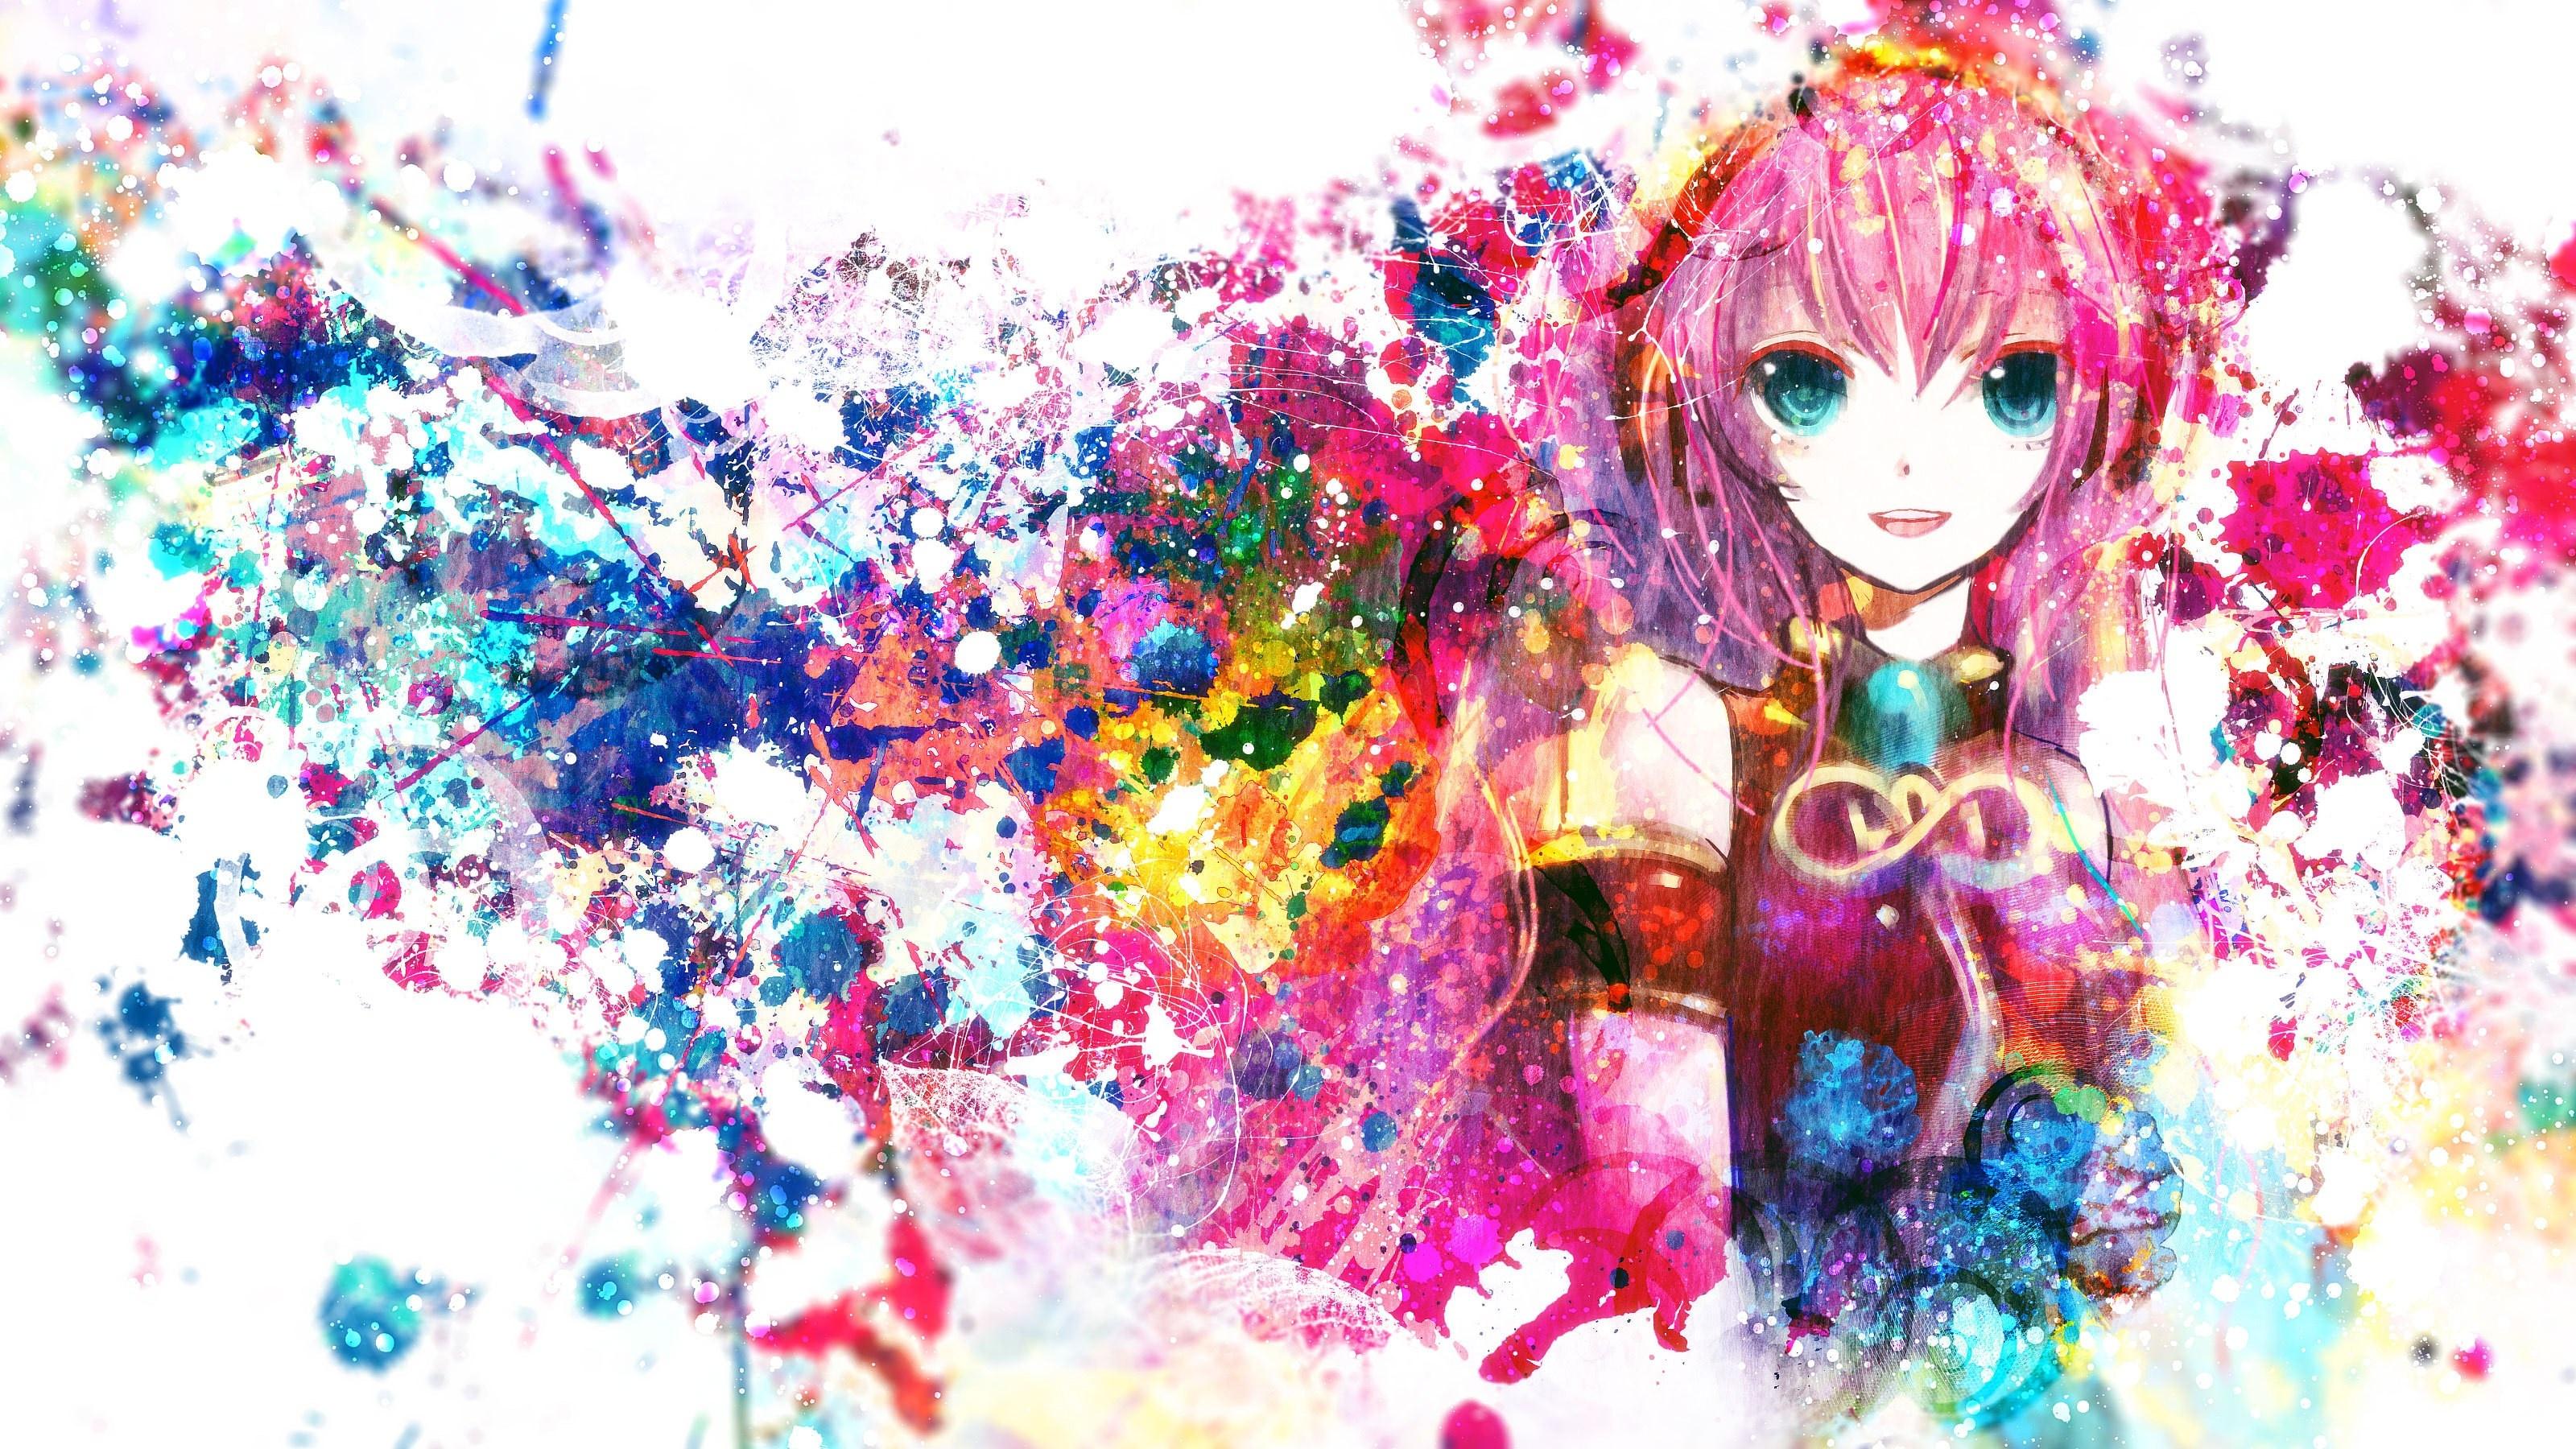 Anime Wallpaper   QyGjxZ 3200x1800